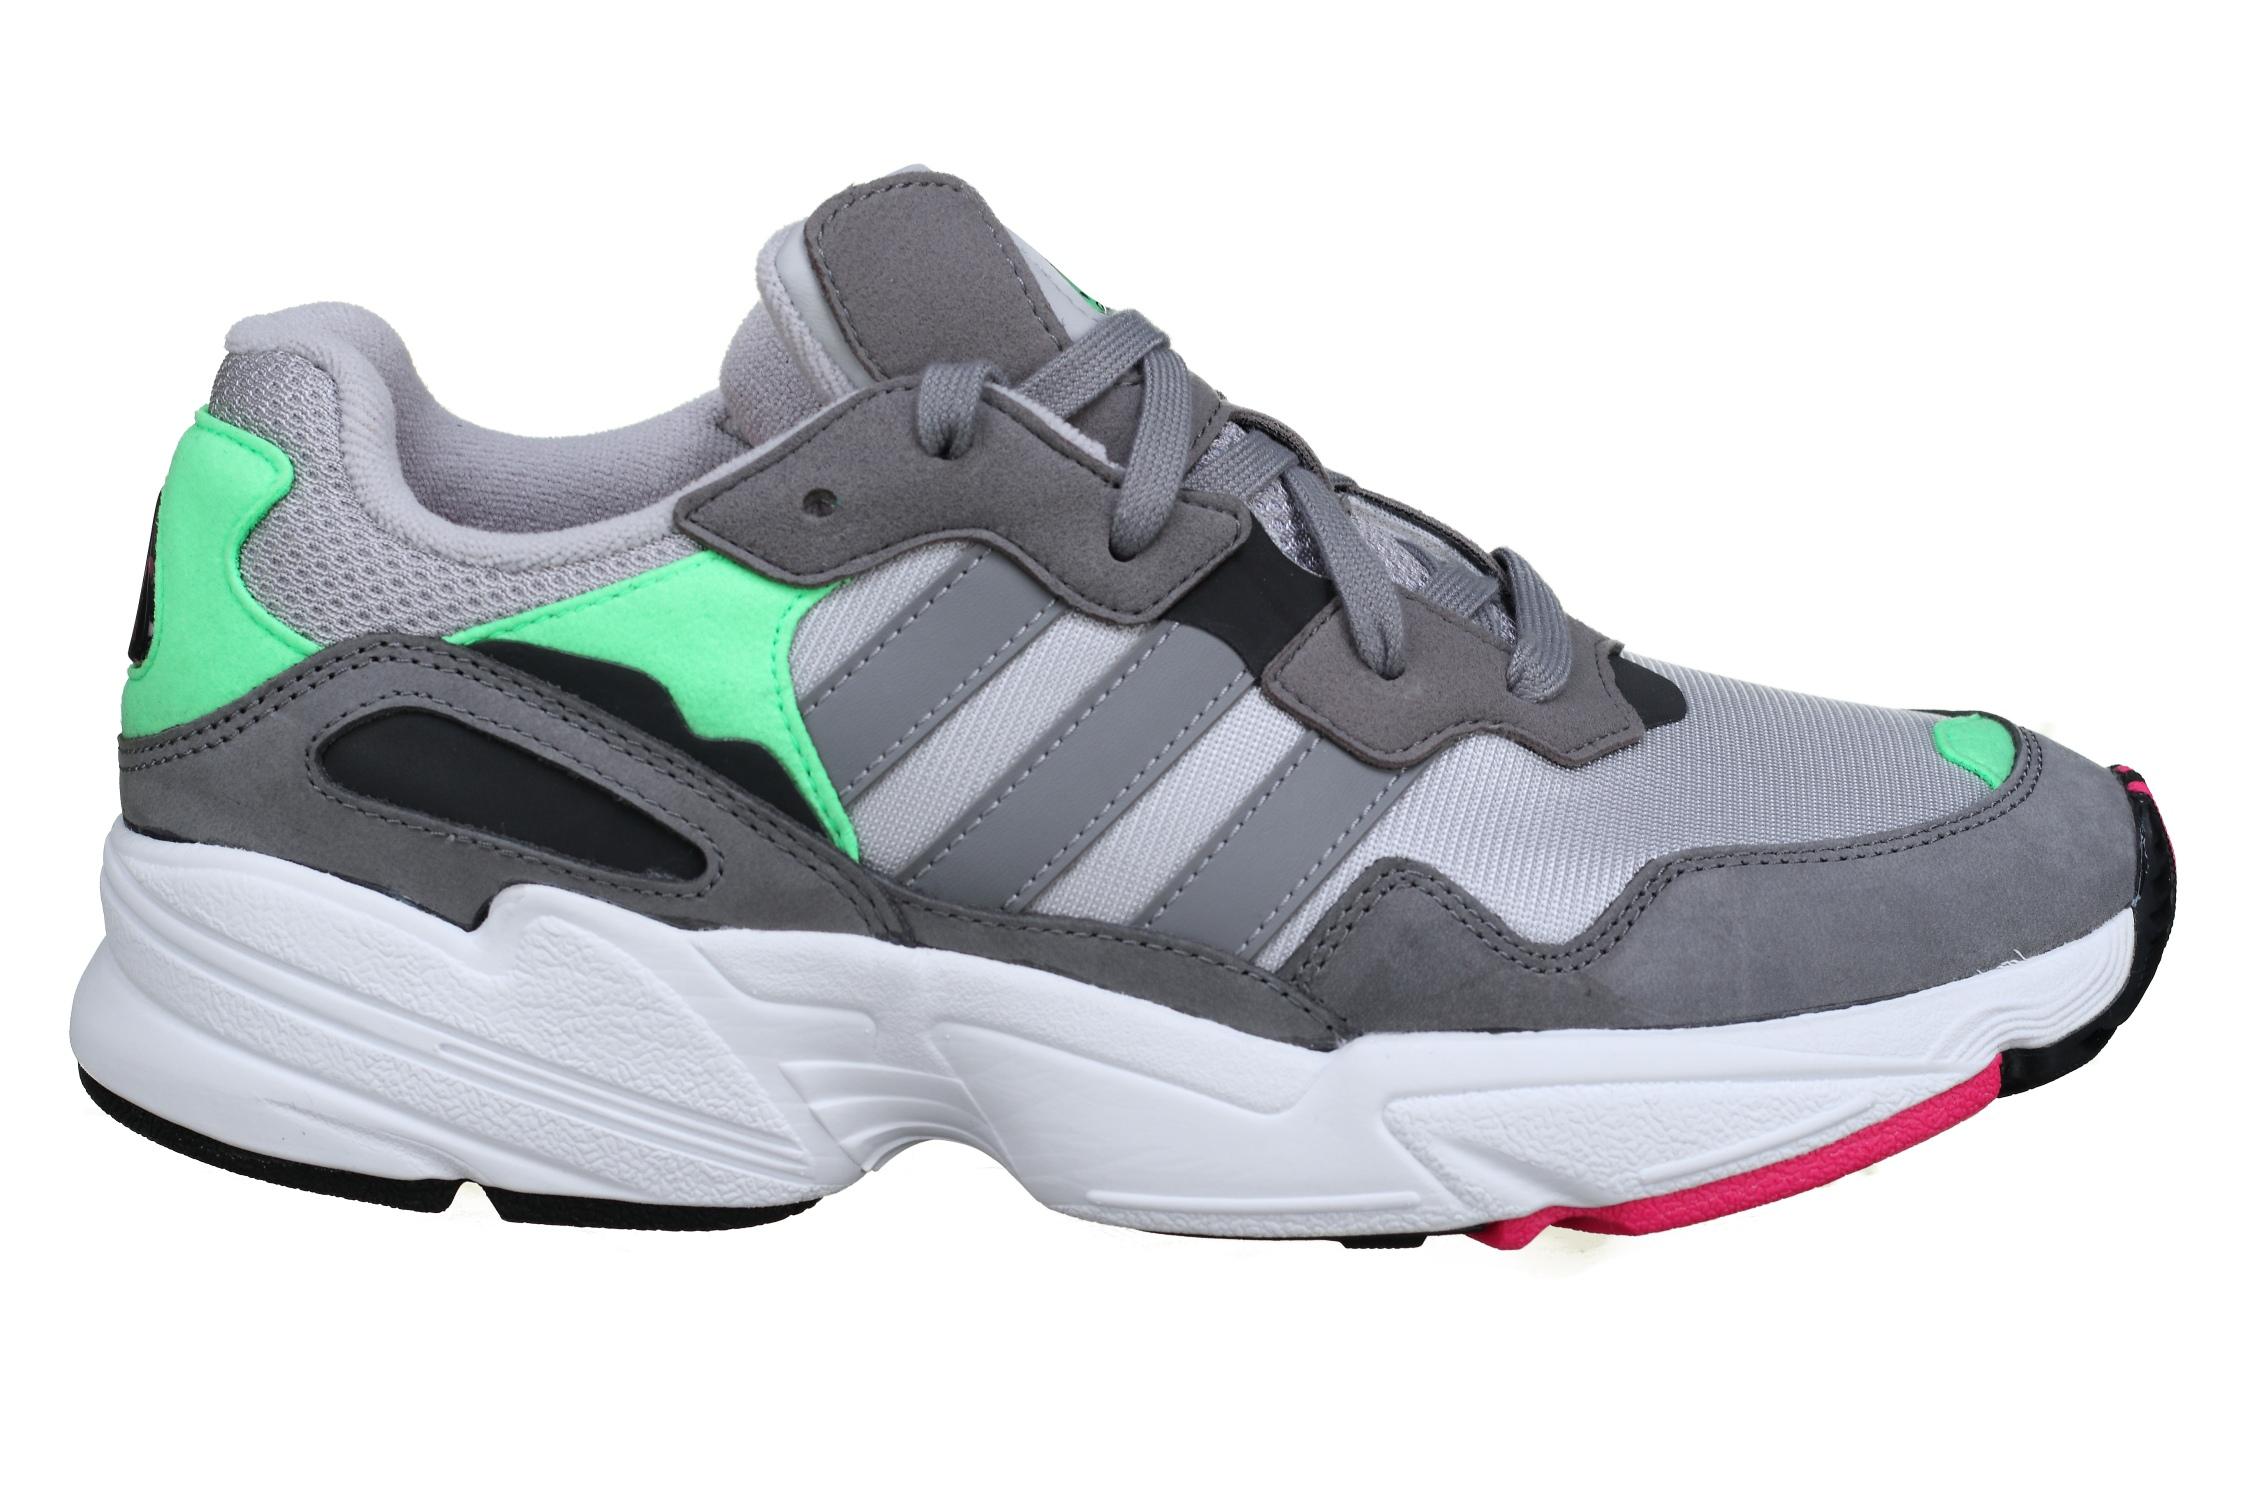 http://www.leadermode.com/162369/adidas-yung-96-f35020-gris.jpg